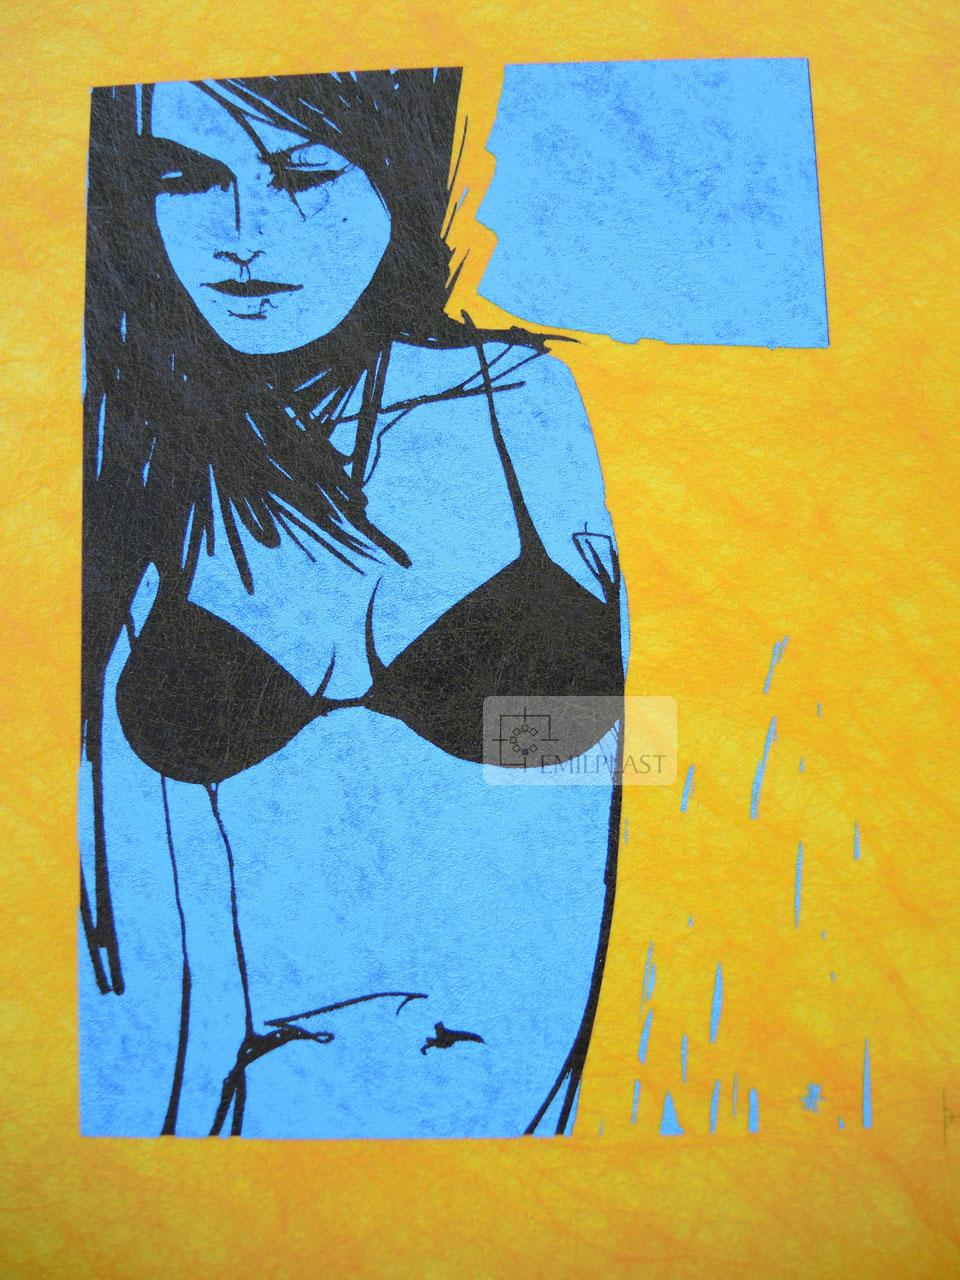 serigrafia-su-carta-twist-02